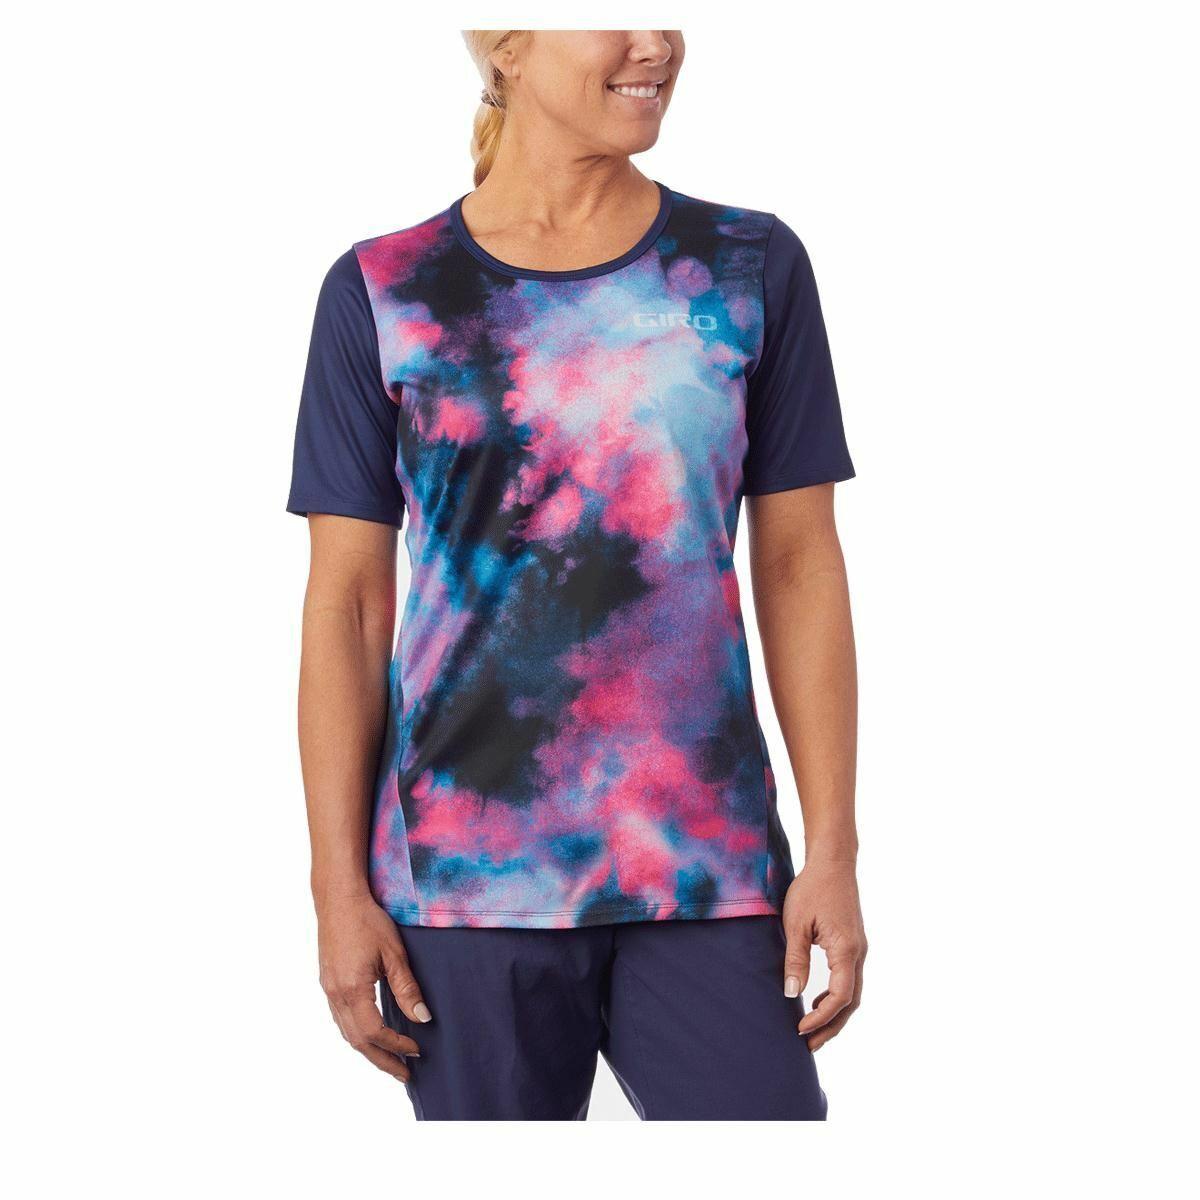 Ciclismo Camiseta manga corta Giro Mujer  Bicicleta MTB 2017 Poza XL Roust  vendiendo bien en todo el mundo